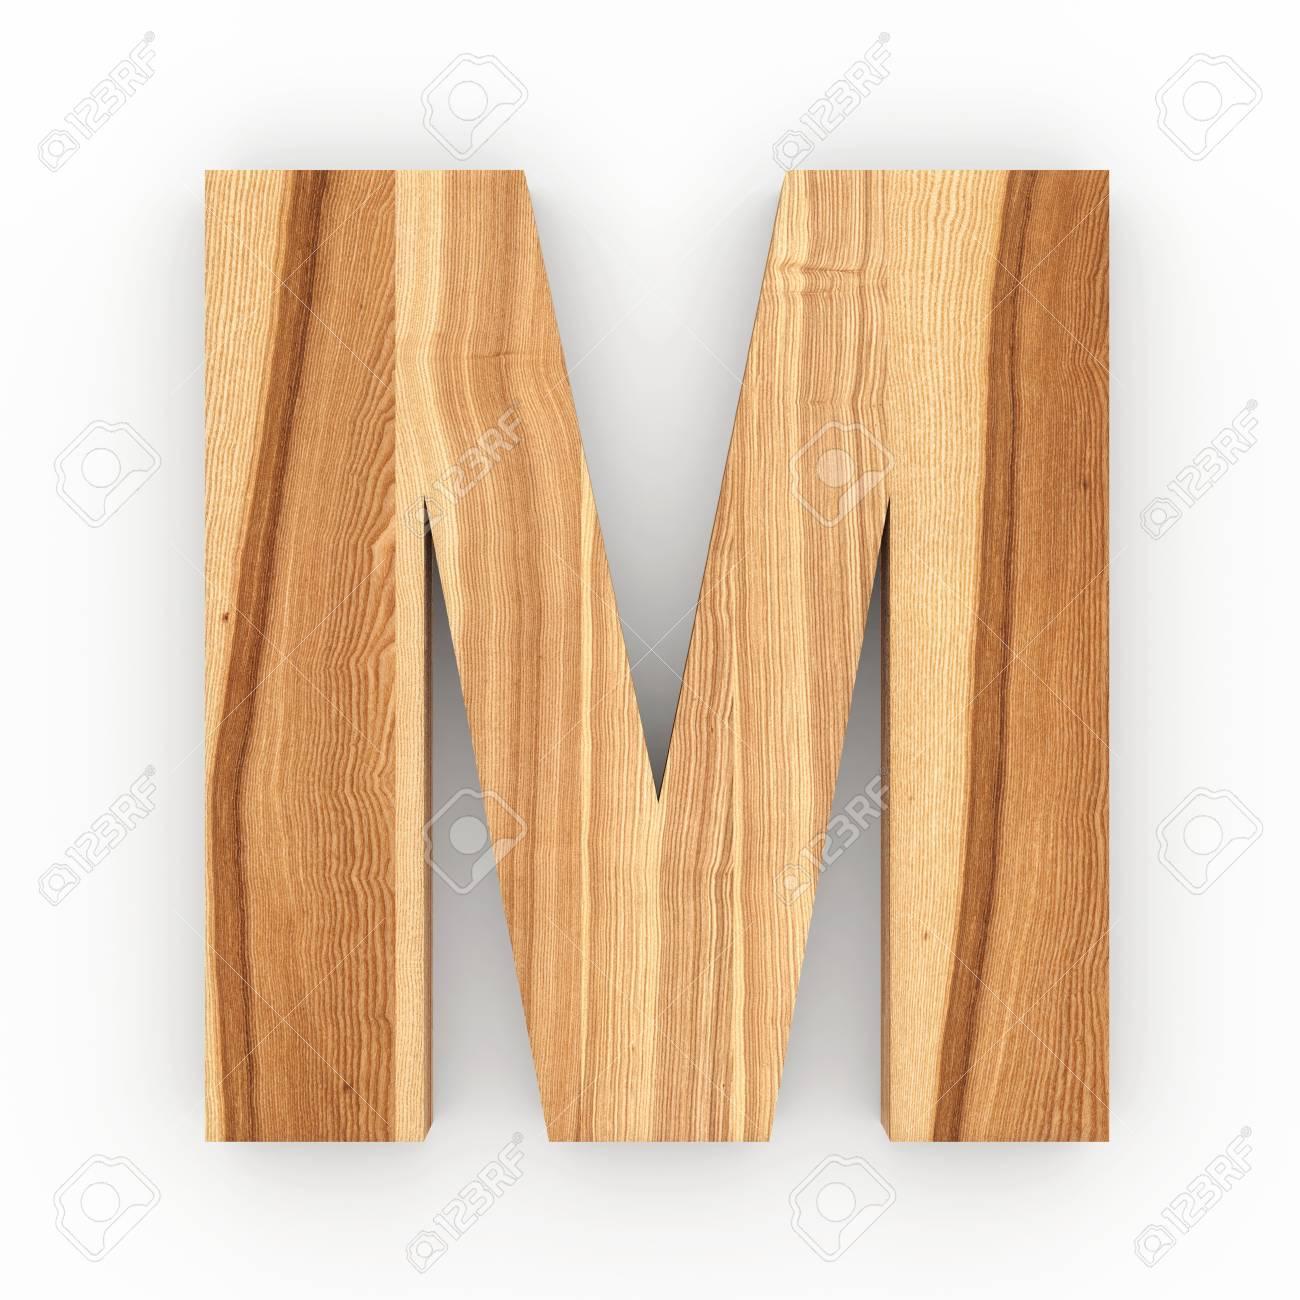 illustration wooden letter m isolated on white background 3d illustration